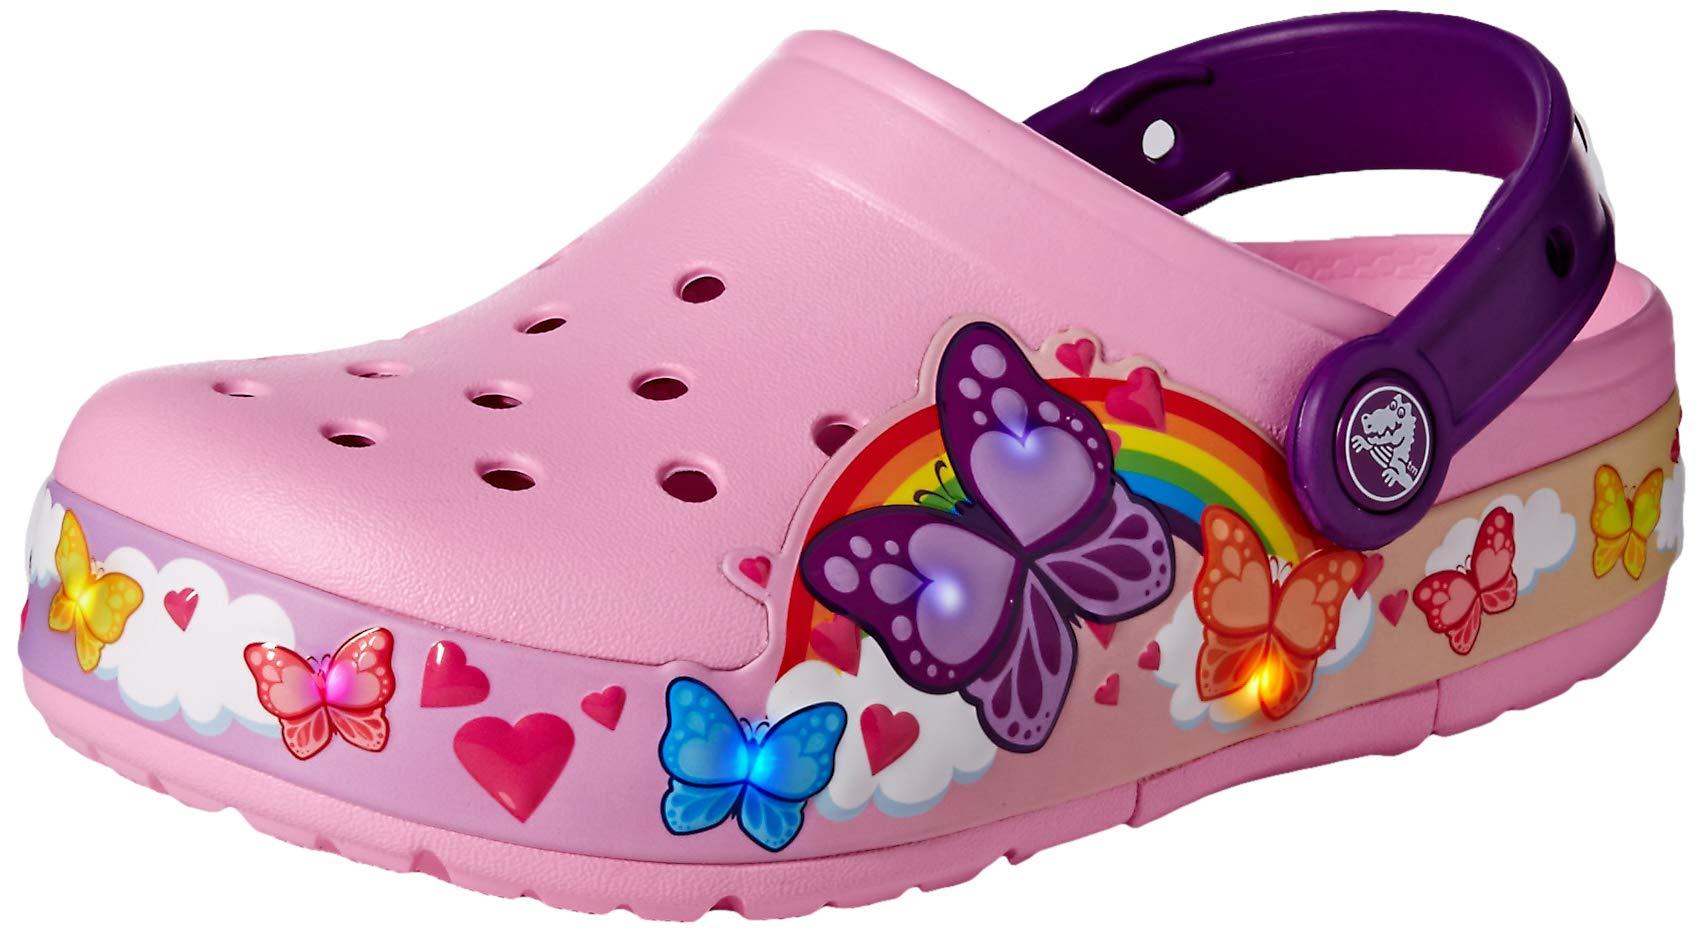 Crocs Kids' Fun Lab Butterfly Band Light-Up Clog, Carnation, 13 M US Little Kid by Crocs